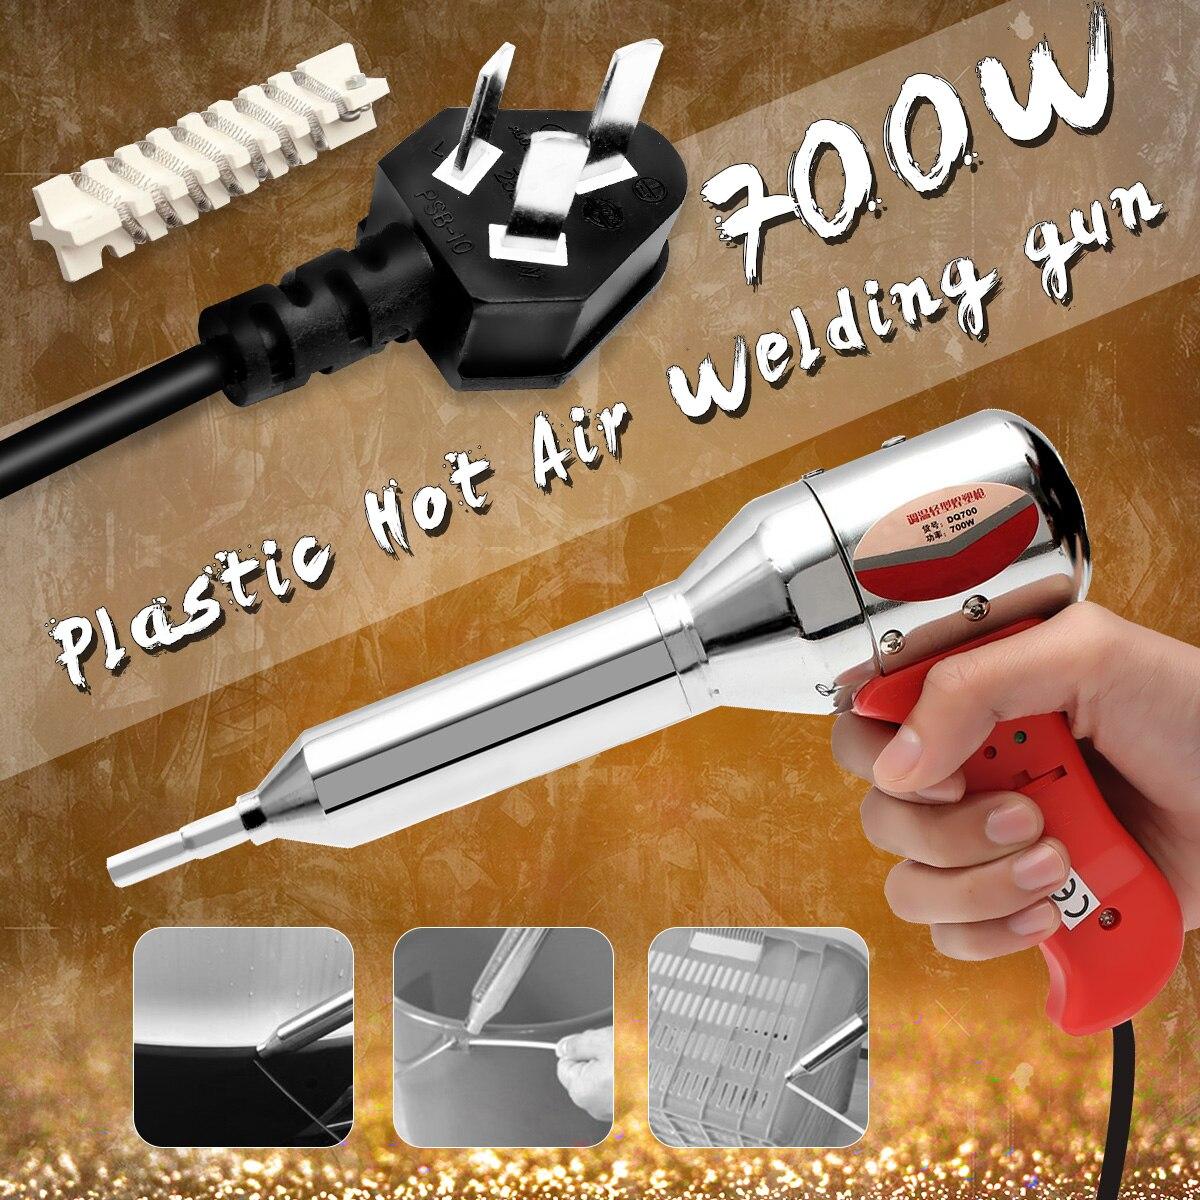 Hot Sale Portable 700W AC 220-240V Red Plastic Hot Air Welding Gun Temperature Heat 100-450 Degree With Ceramic Heater